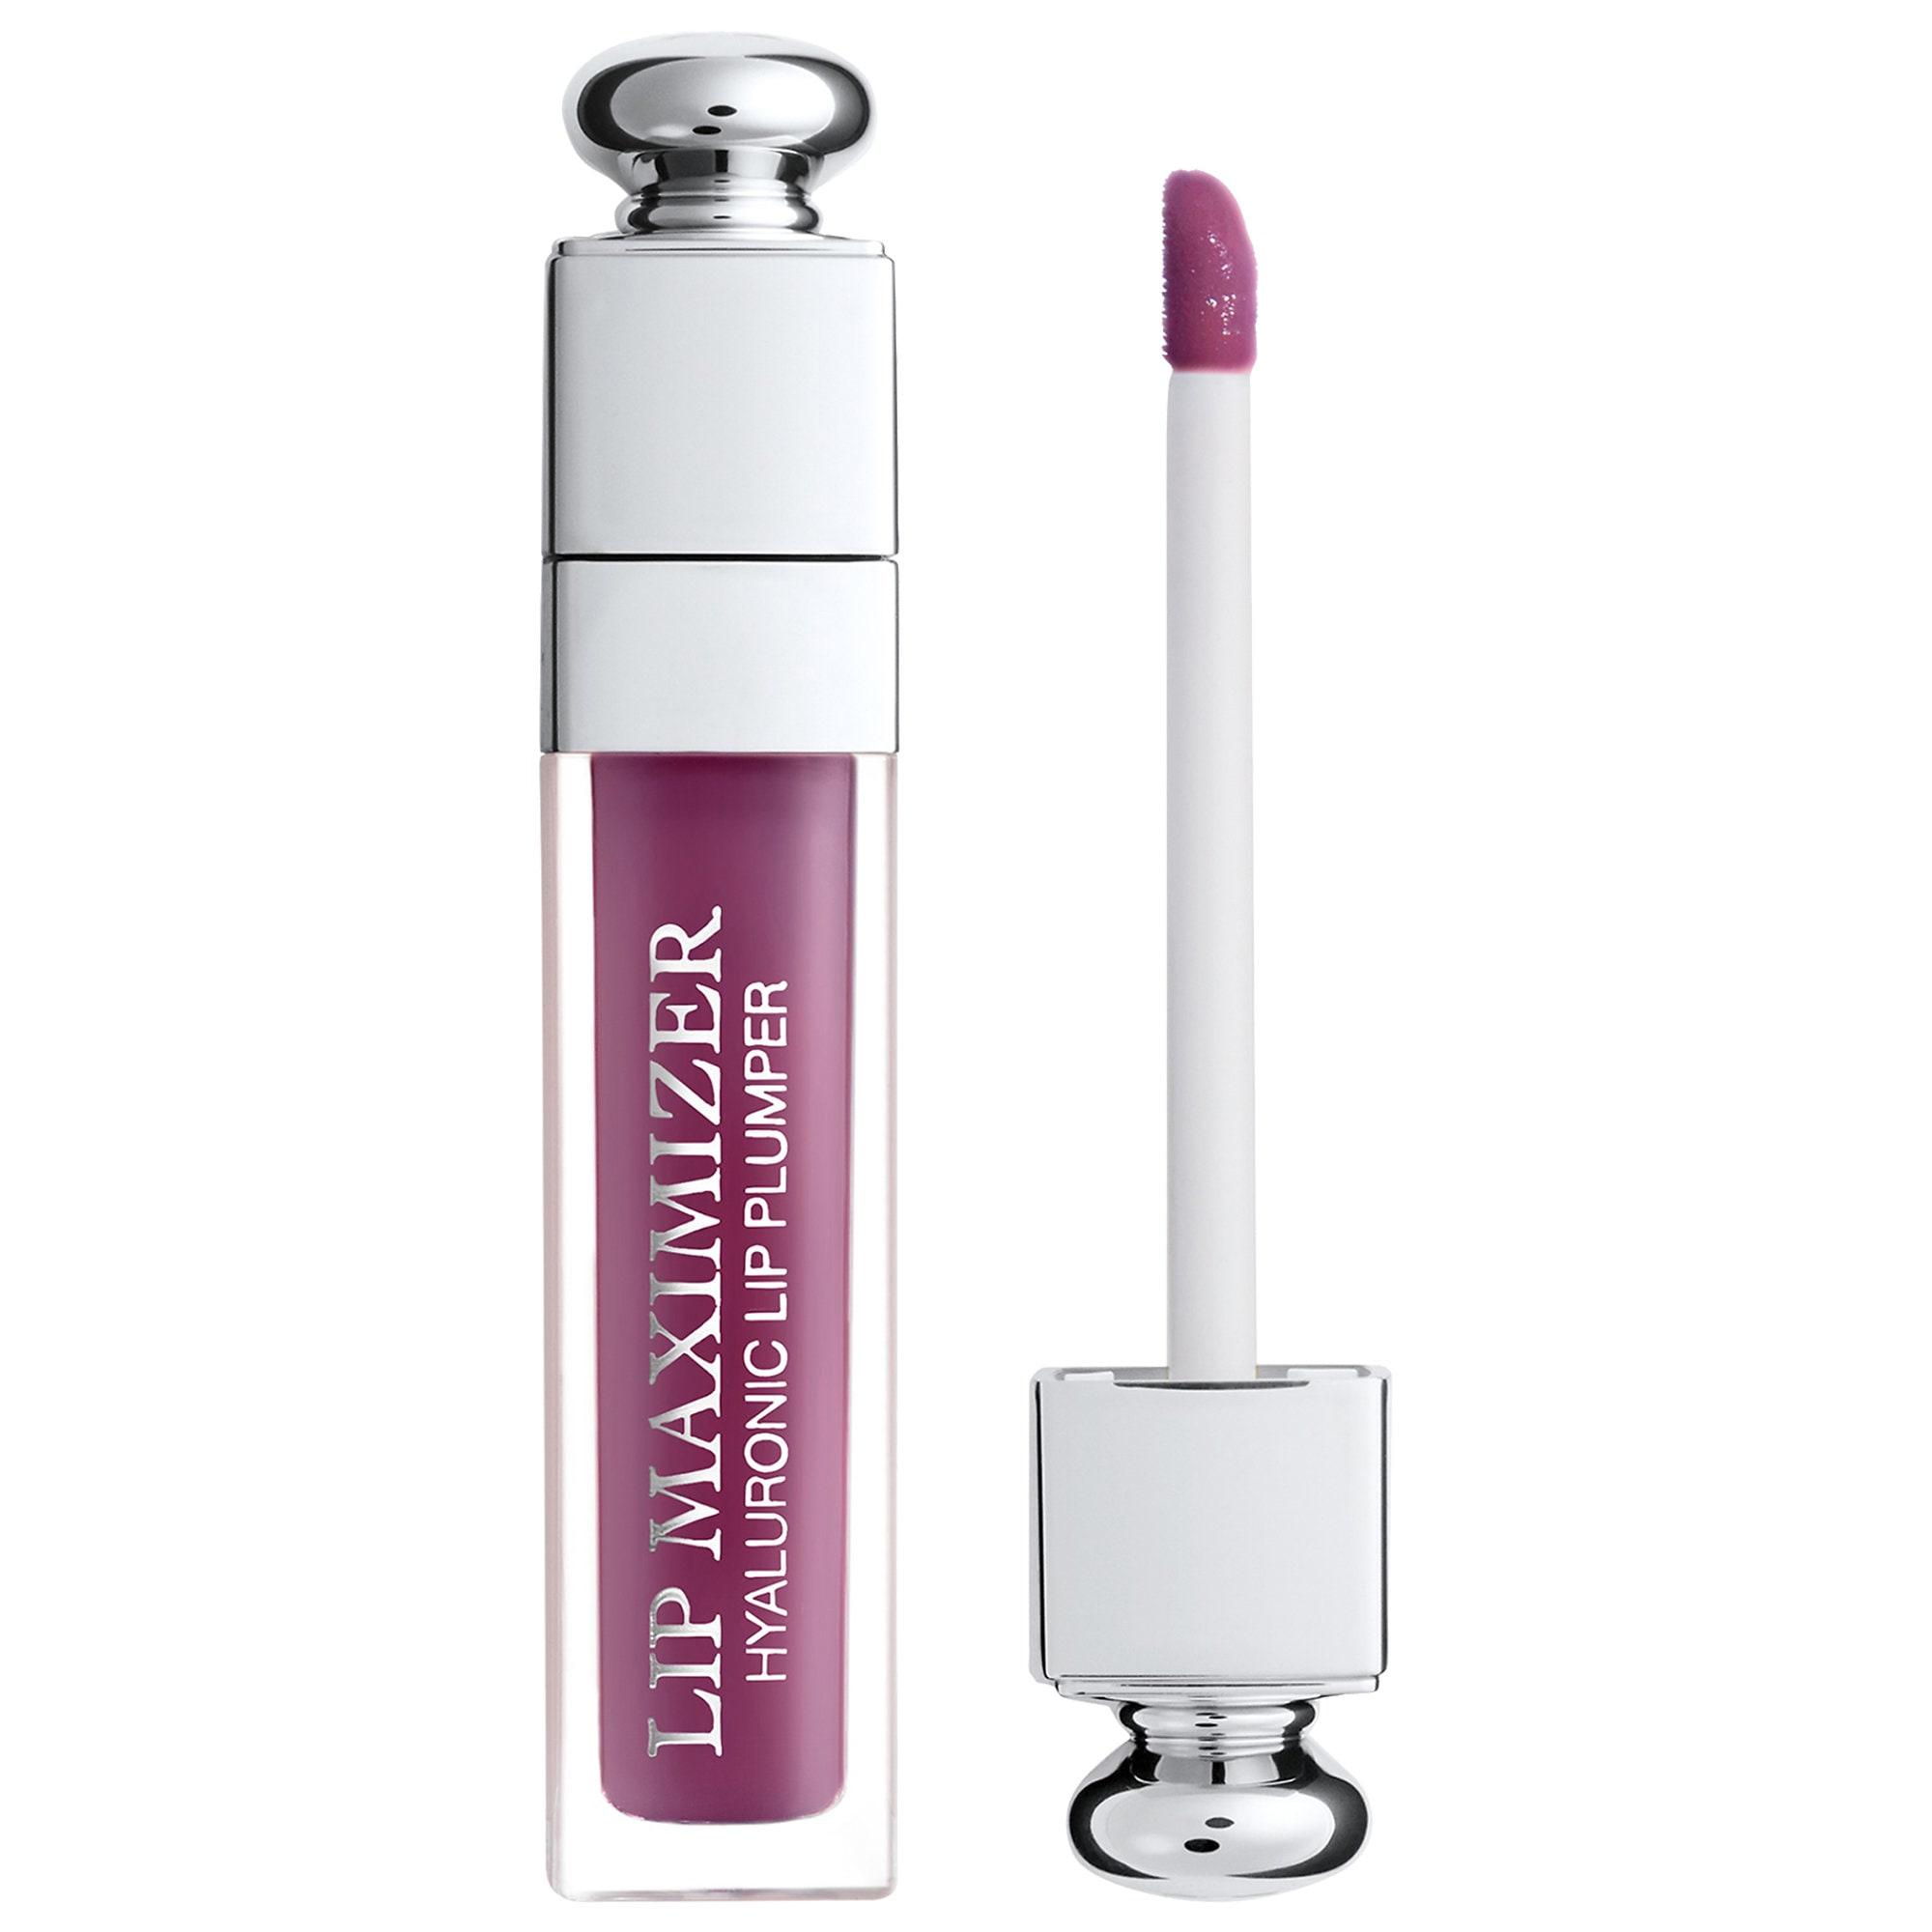 Dior - Addict Lip Maximizer Plumping Gloss